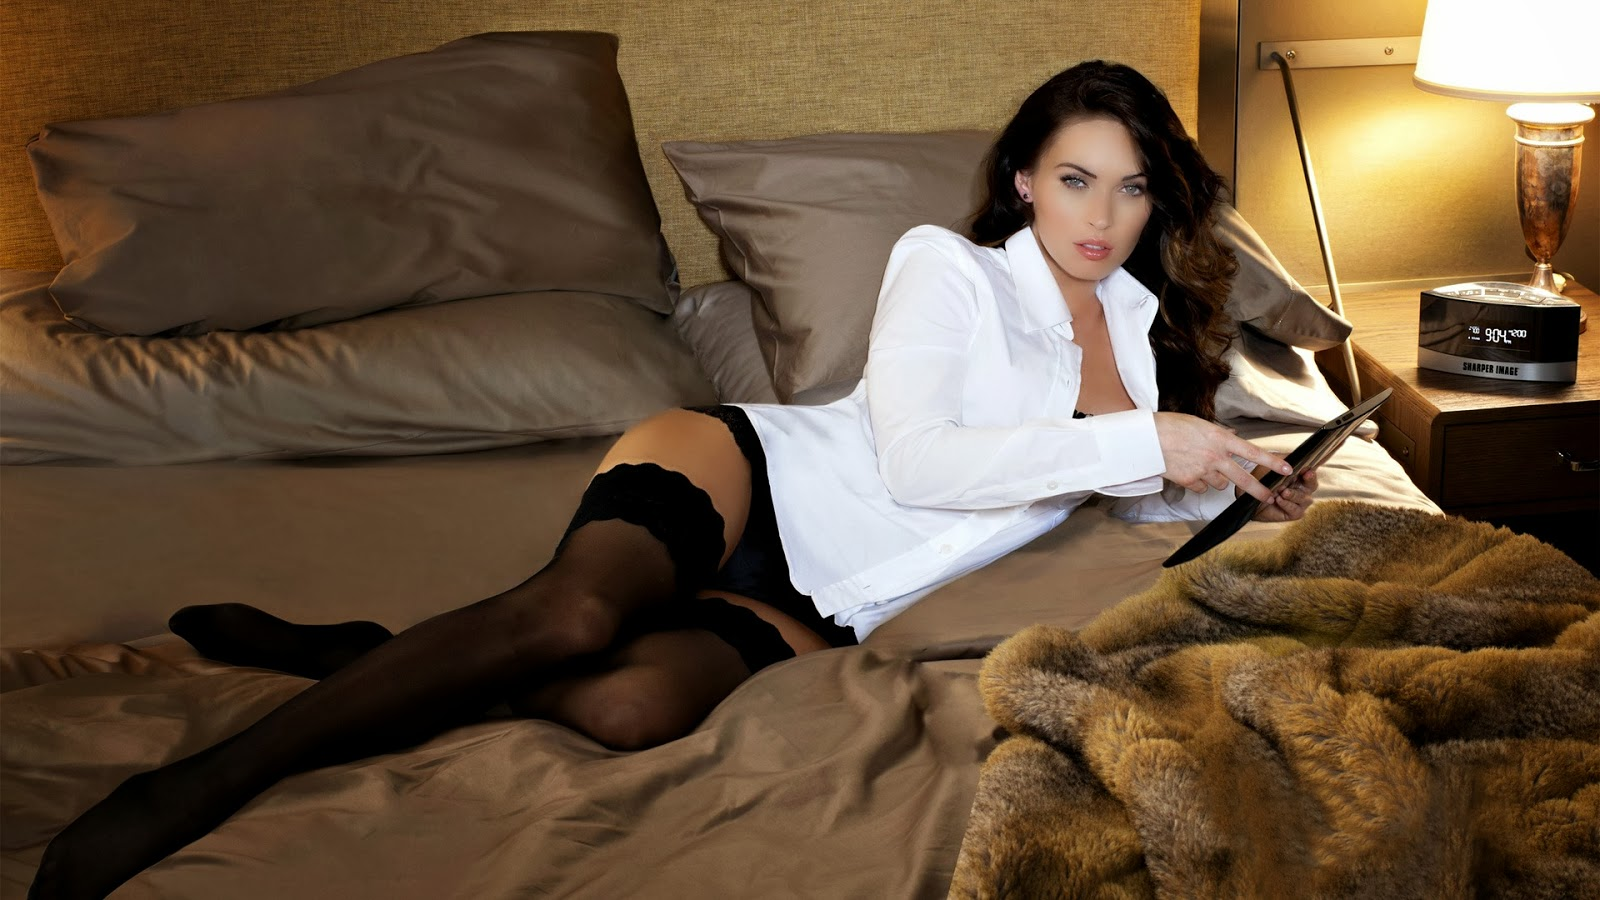 Celebrity Hd Wallpapers American Actress Megan Fox Sexy -5678